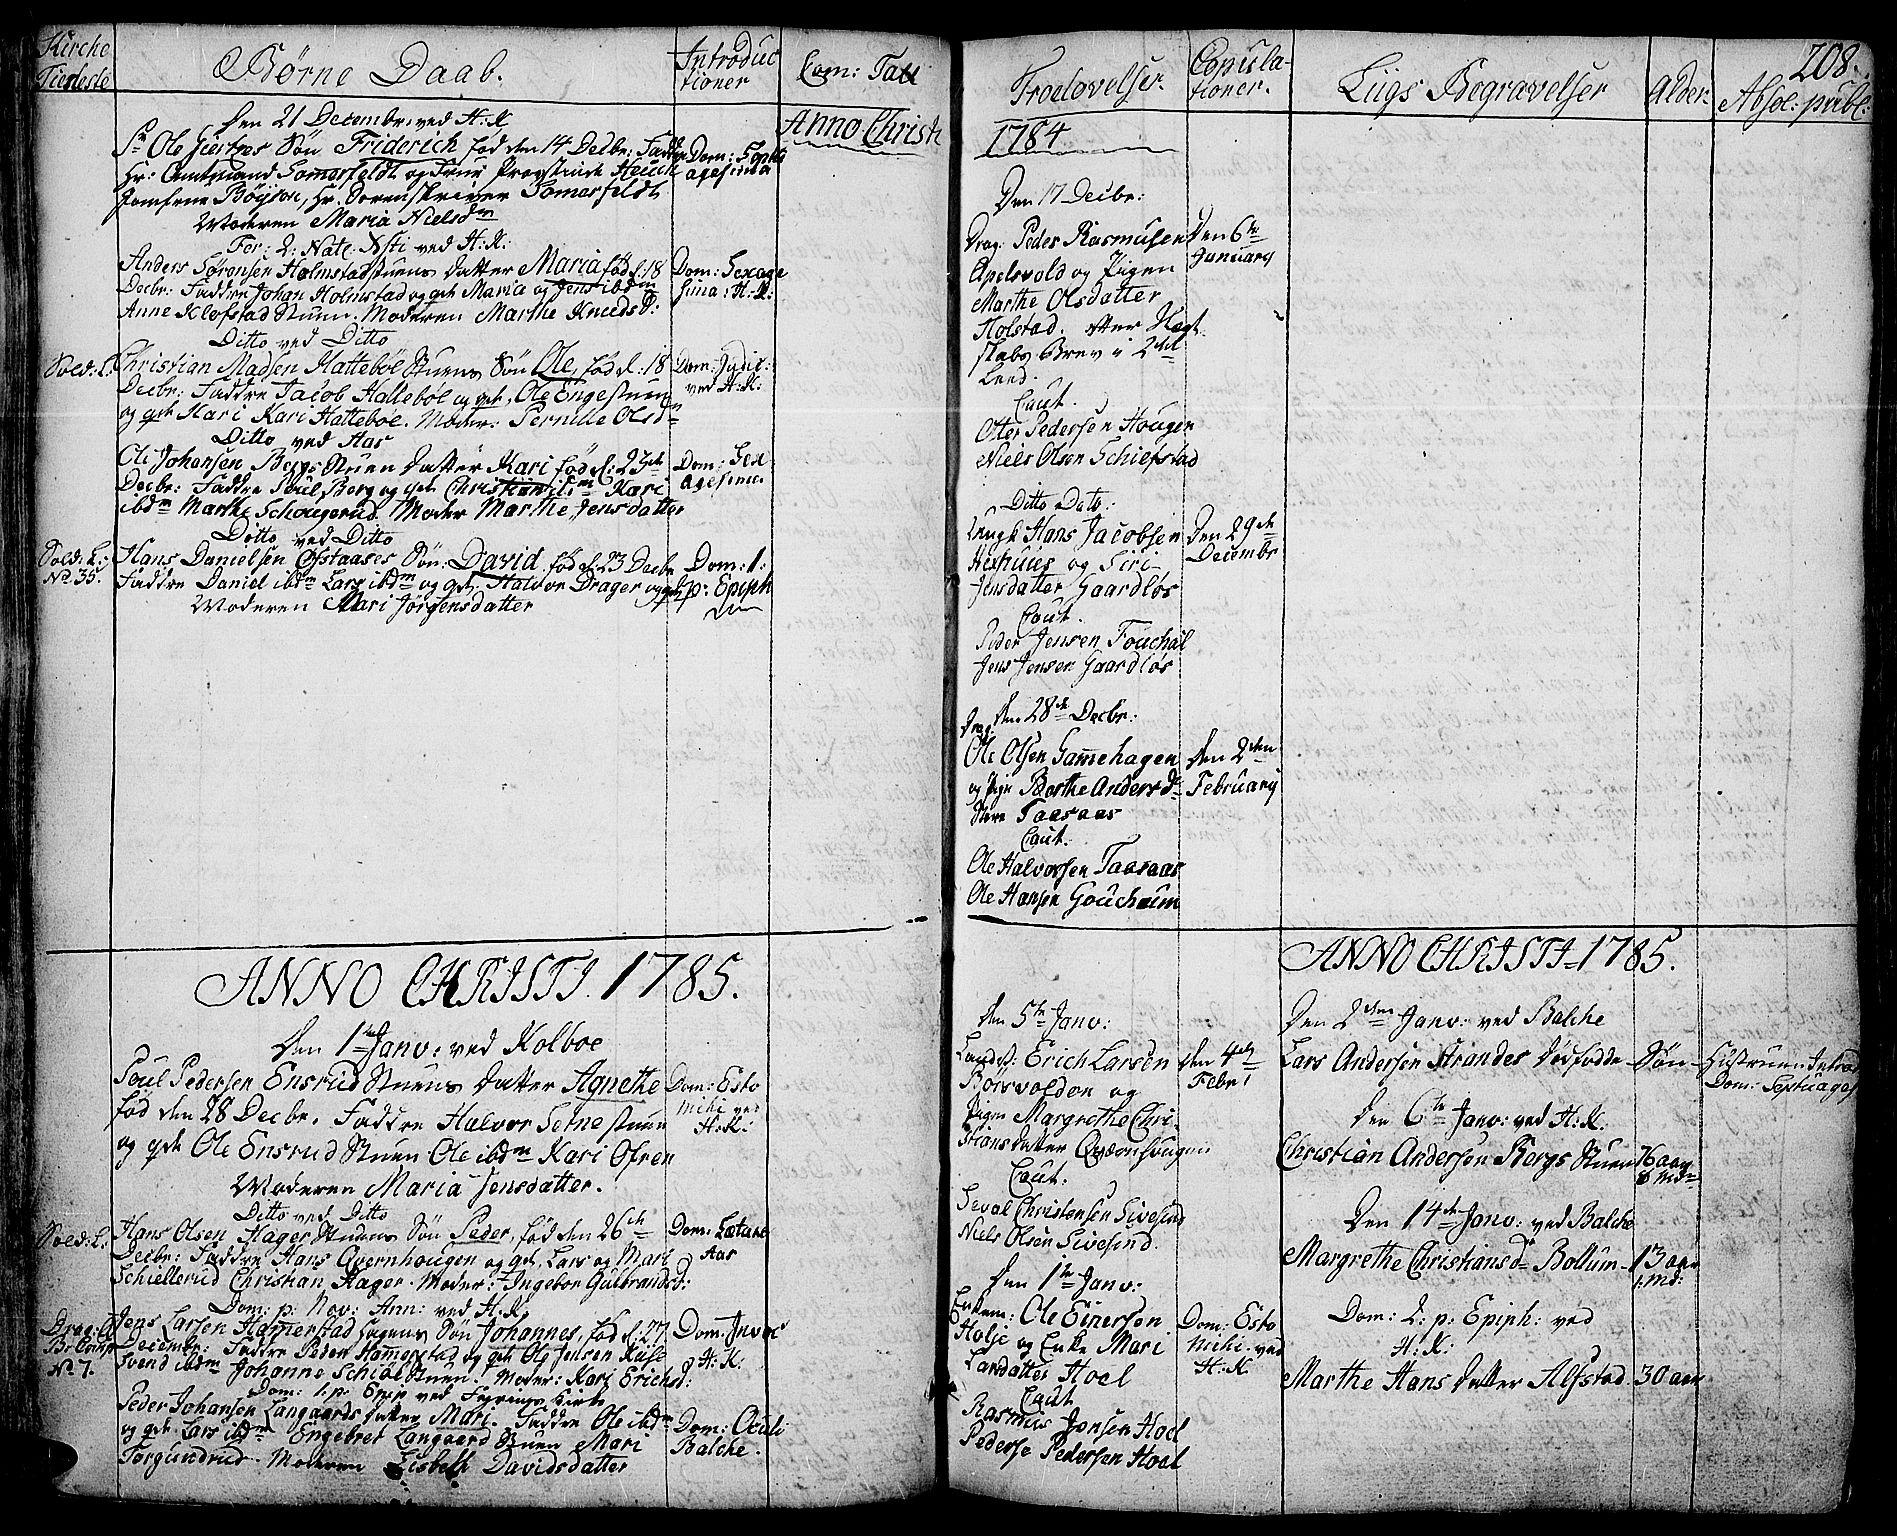 SAH, Toten prestekontor, Ministerialbok nr. 6, 1773-1793, s. 208